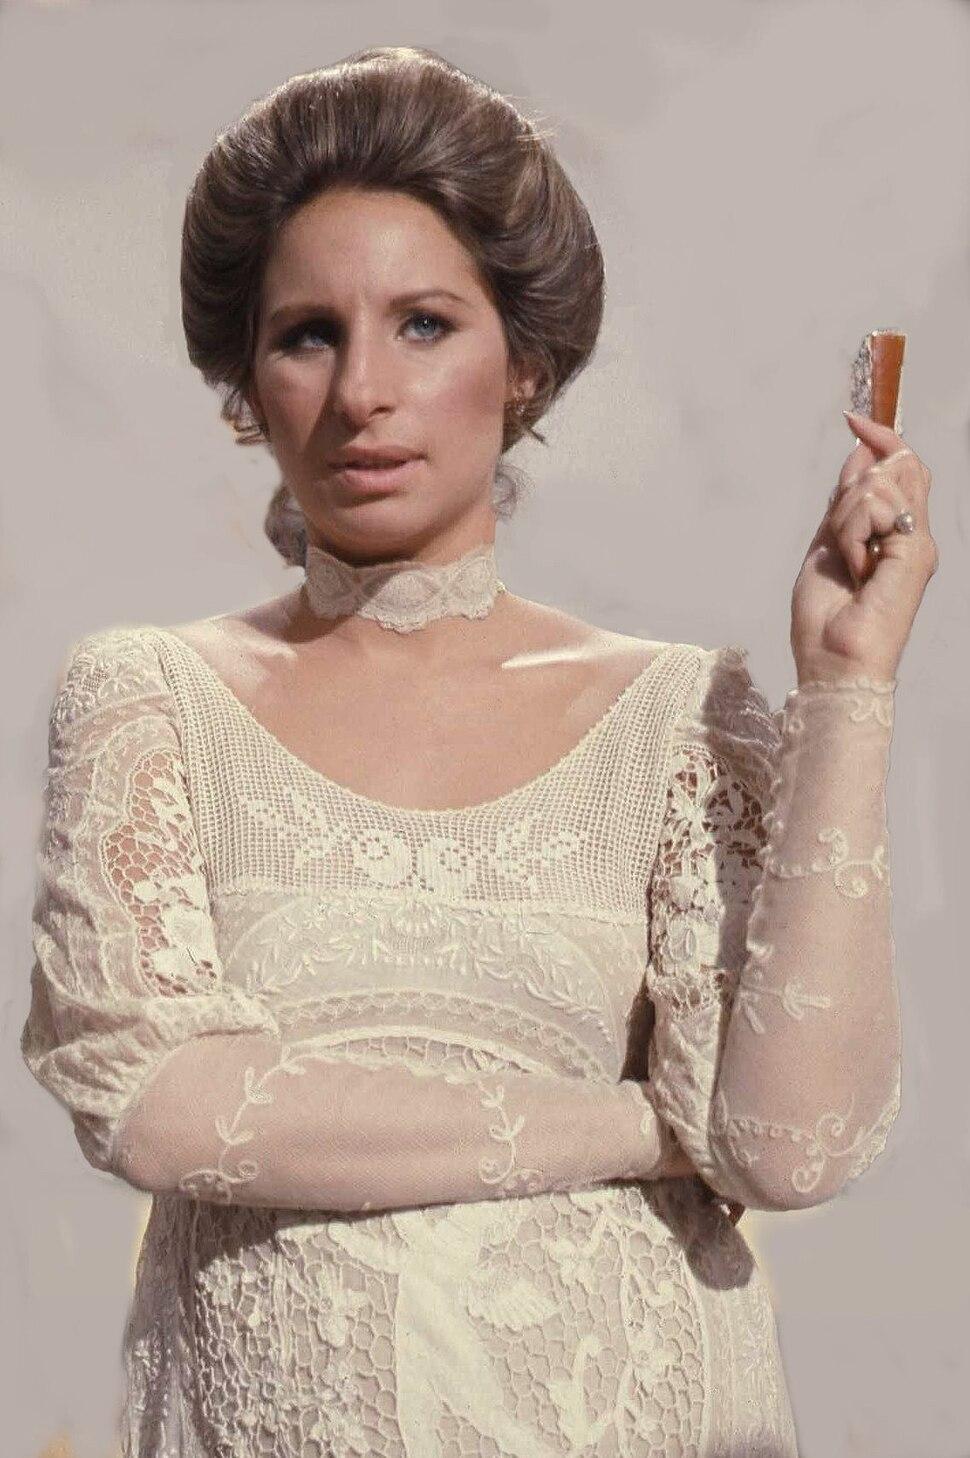 Barbra Streisand Allan Warren